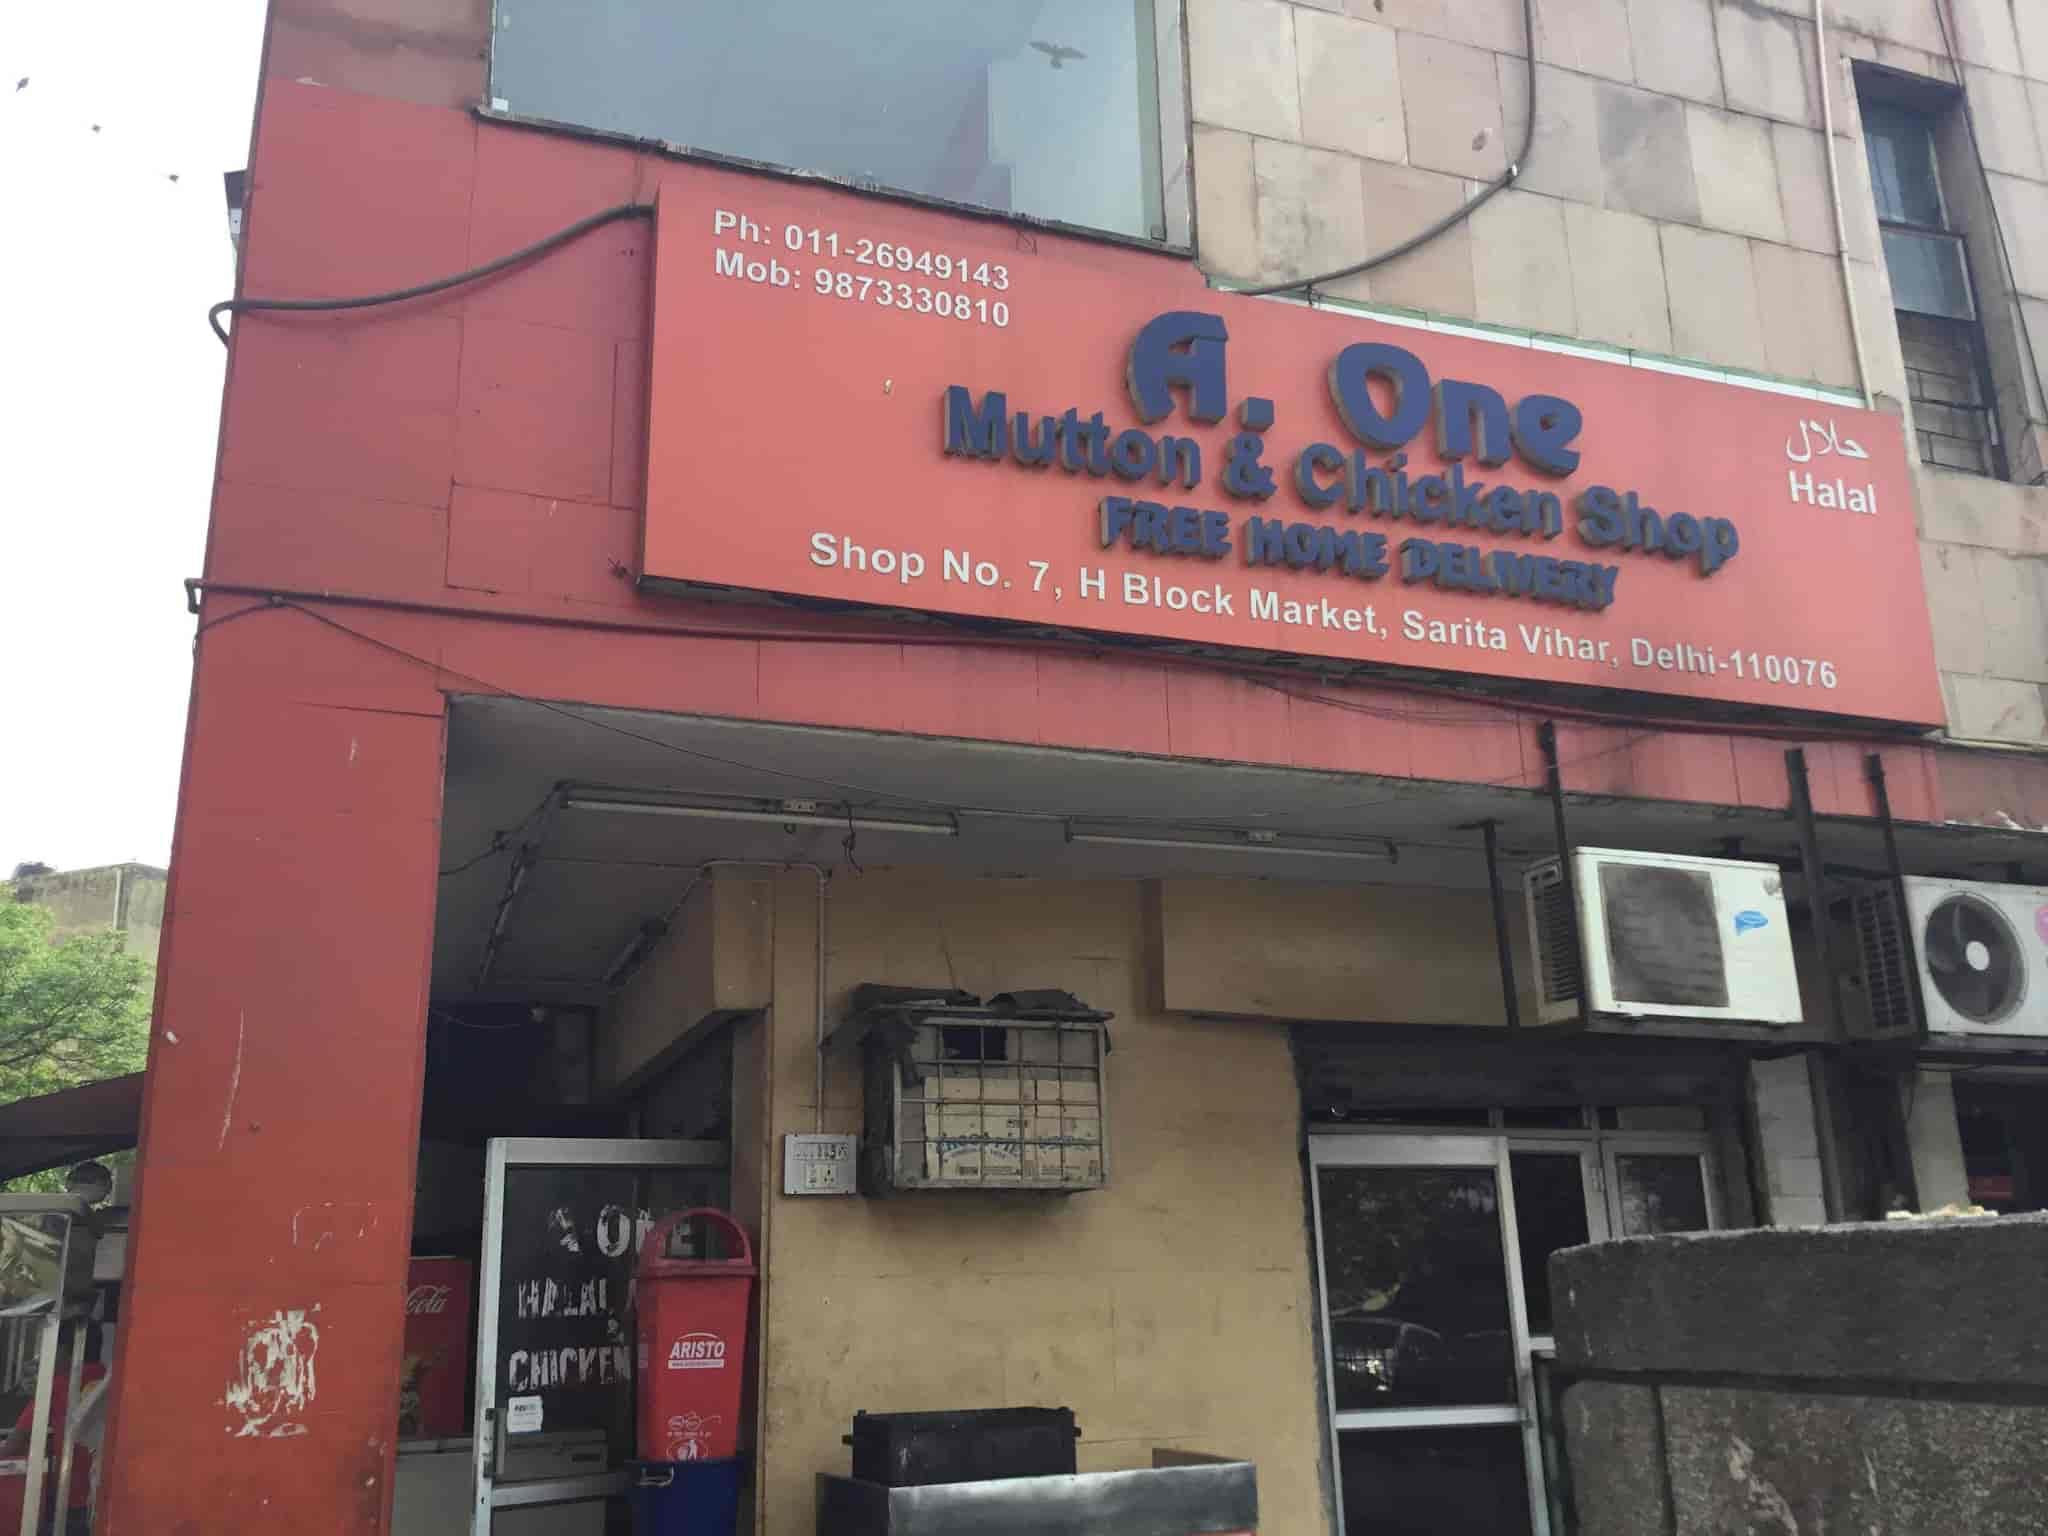 A One Halal Meat Chicken Shop Photos, Sarita Vihar, Delhi- Pictures